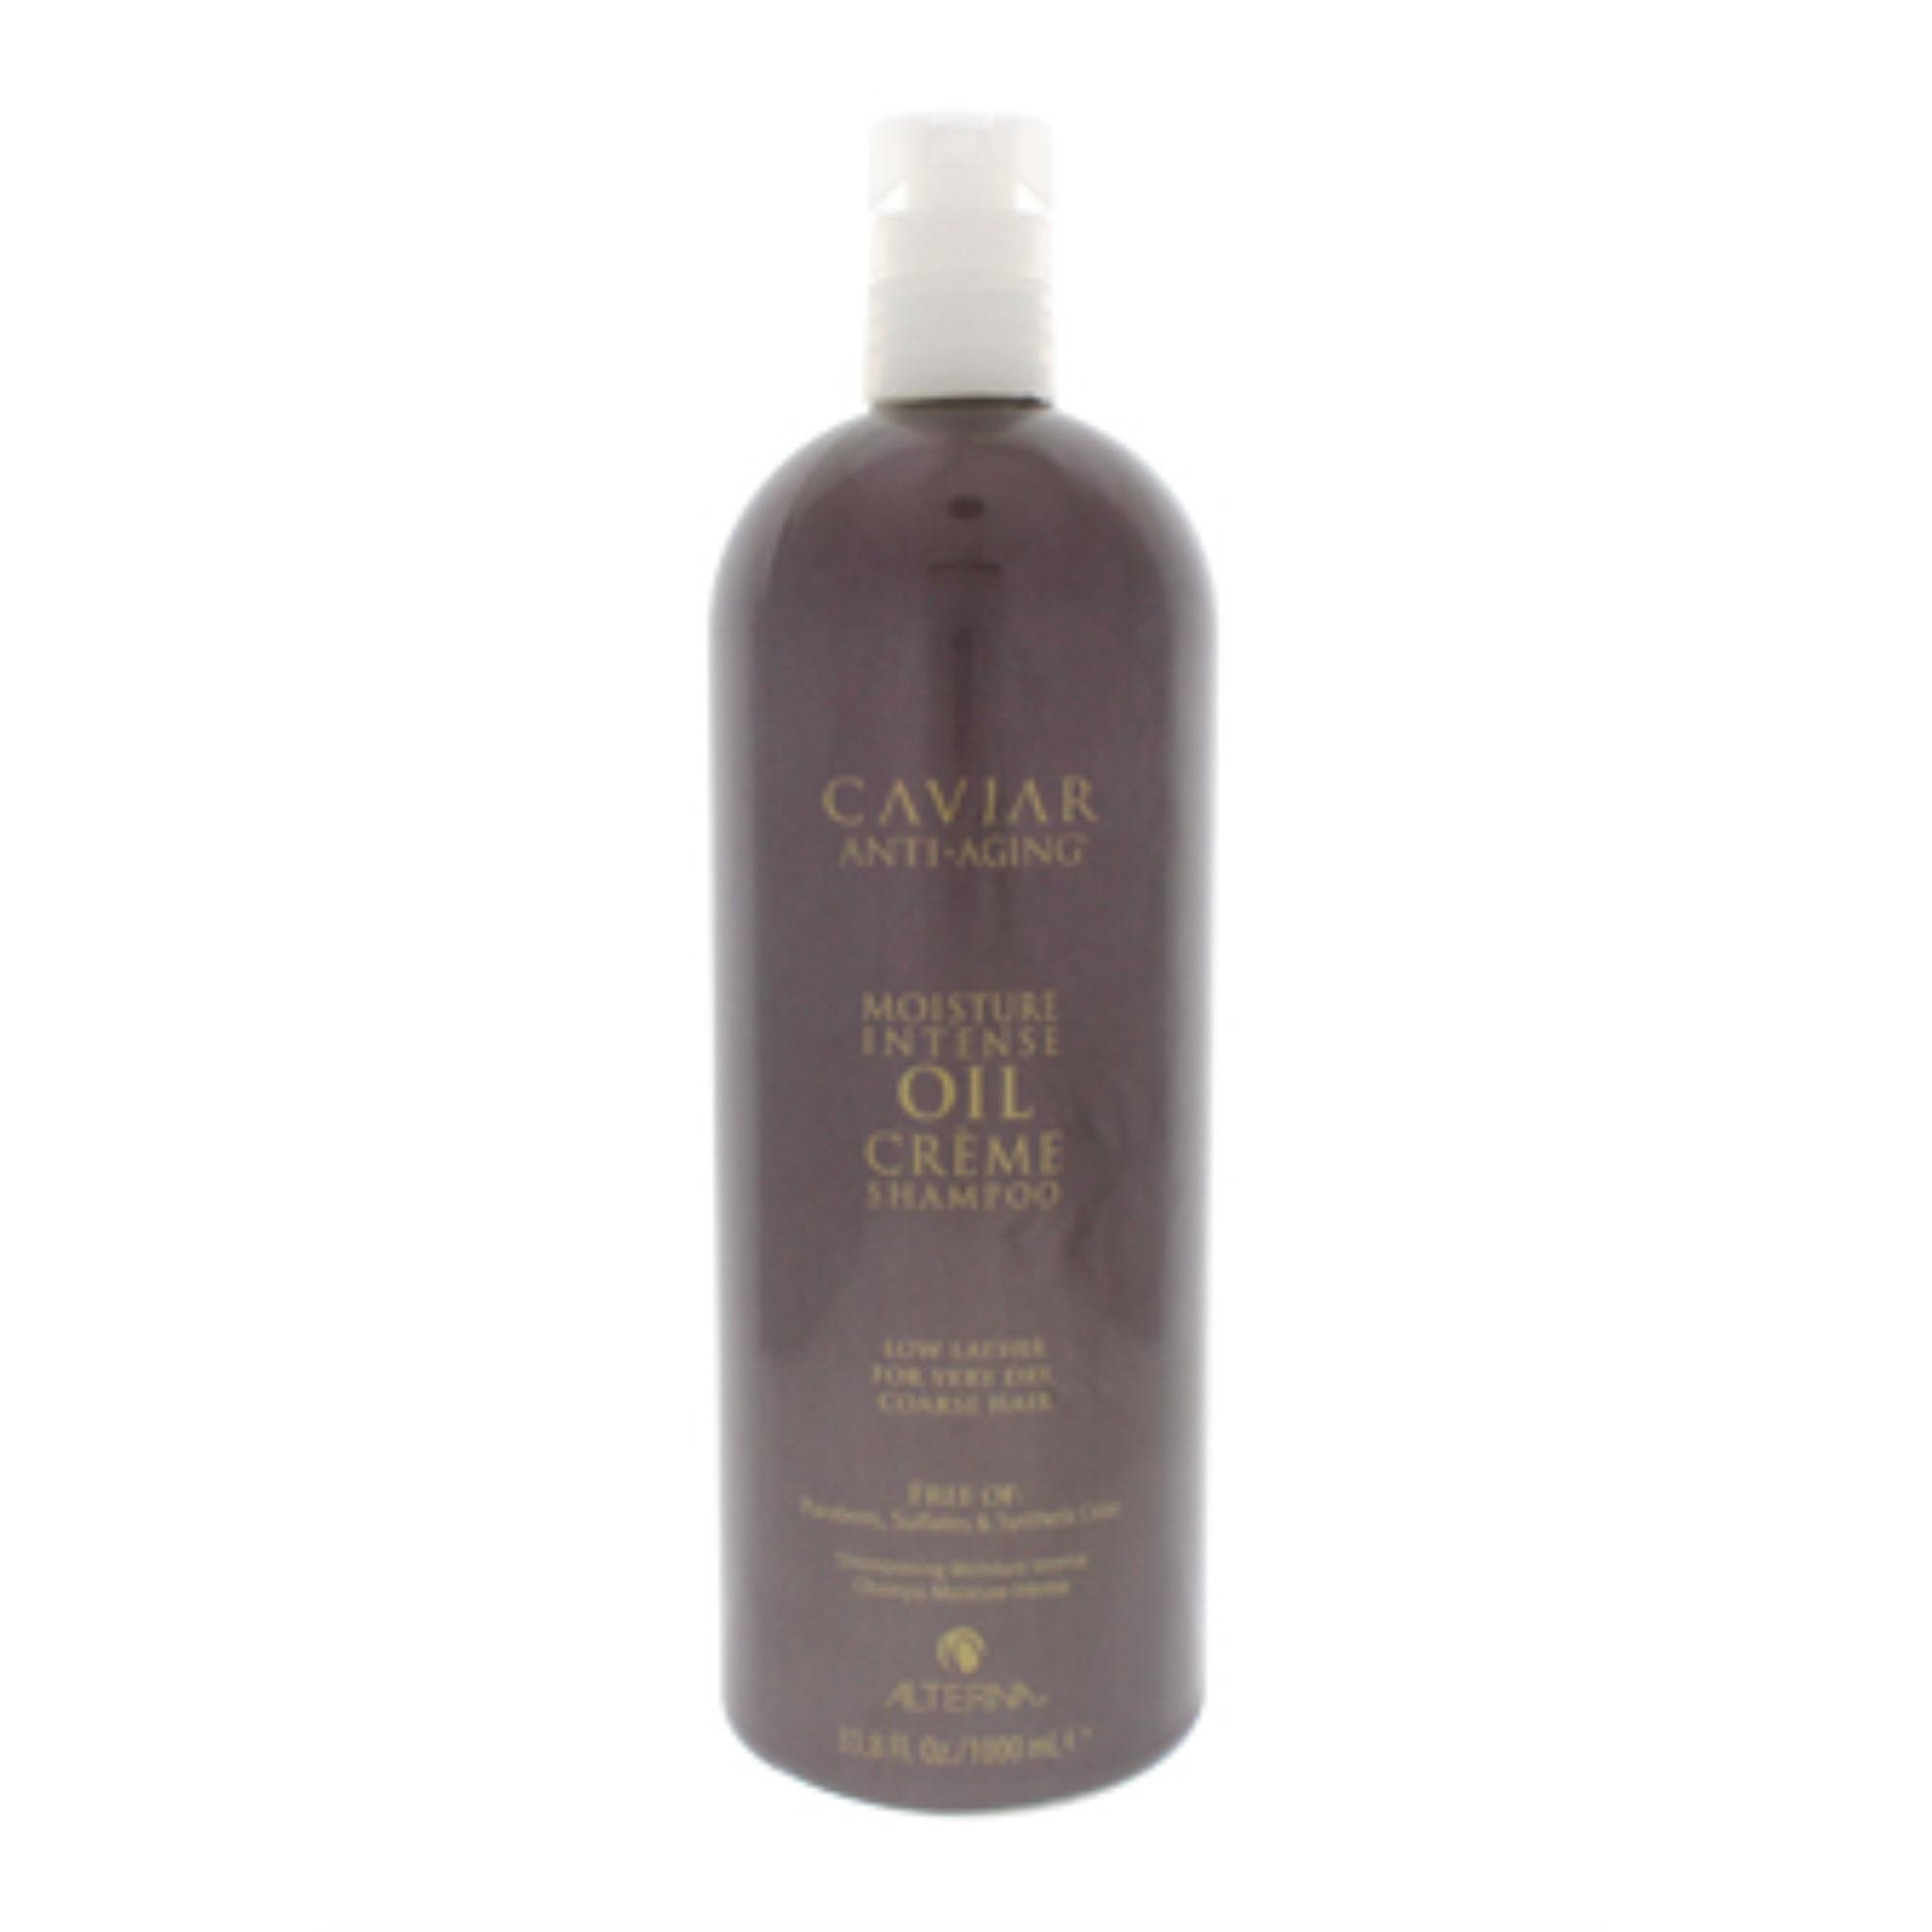 Caviar Anti-Aging Moisture Intense Oil Creme Shampoo by Alterna for Unisex - 33.8 oz Shampoo - image 1 of 3